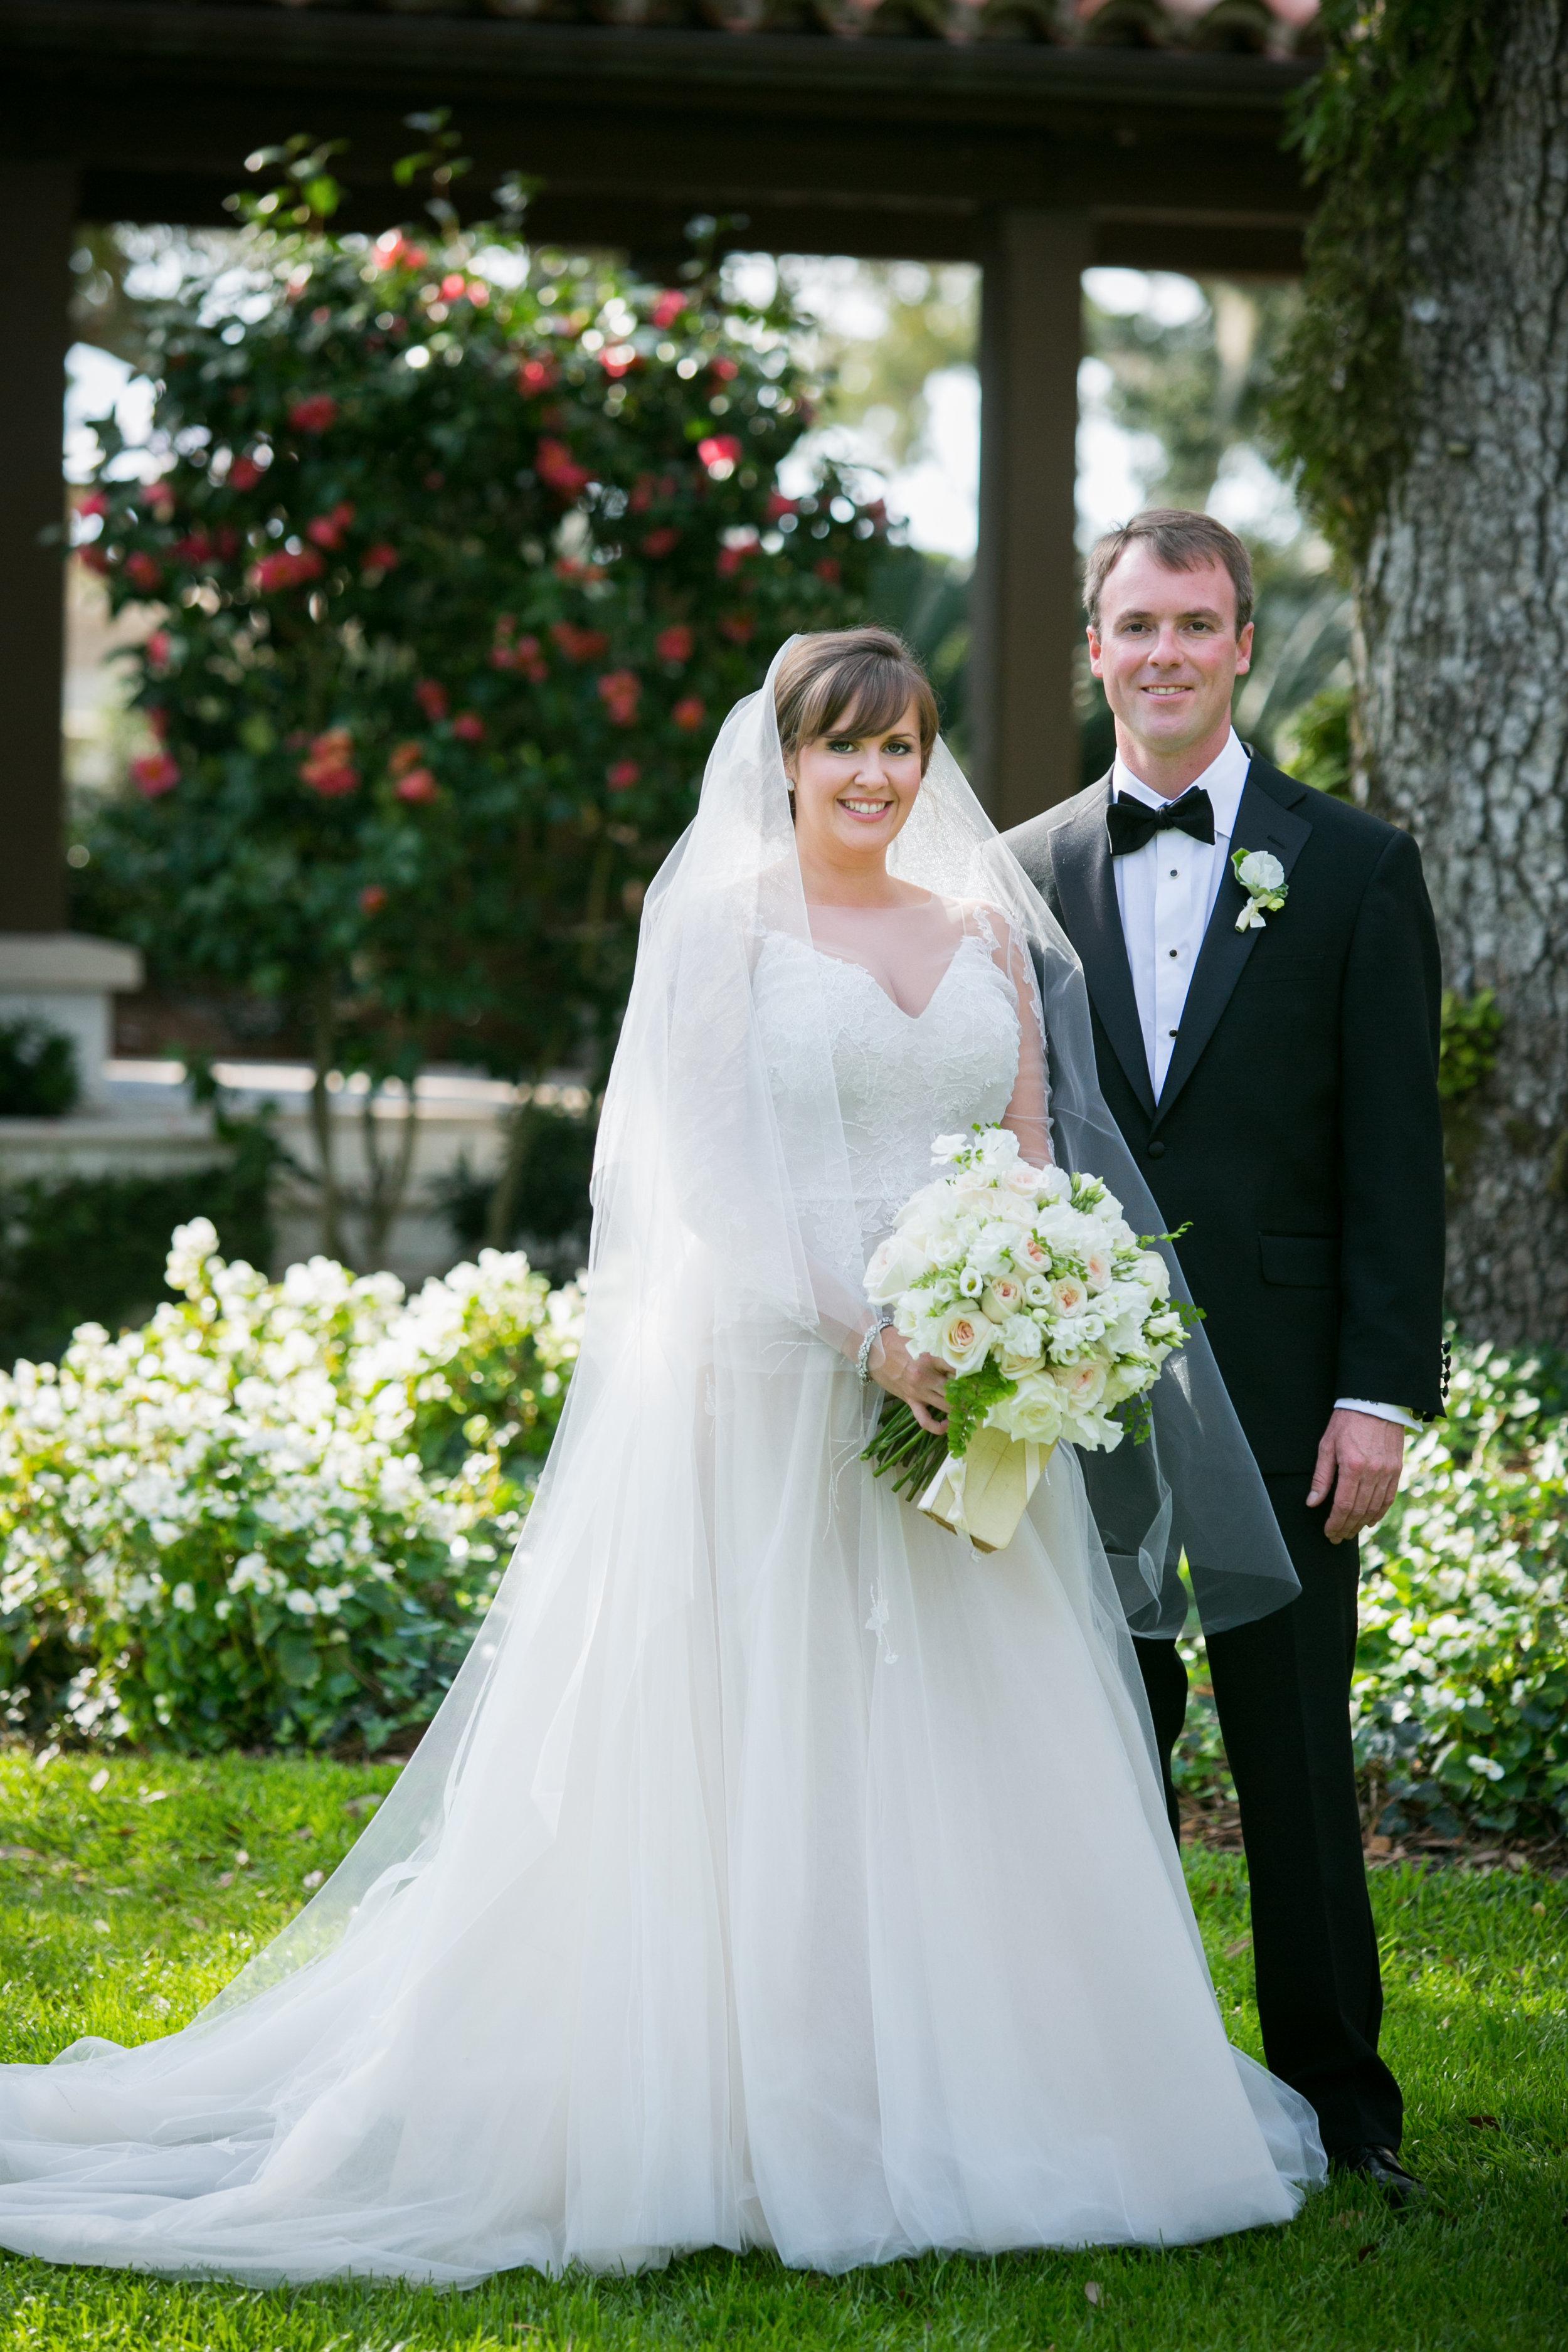 Sea Island wedding at The Cloister by Savannah, GA vendor Caroline Carter Events